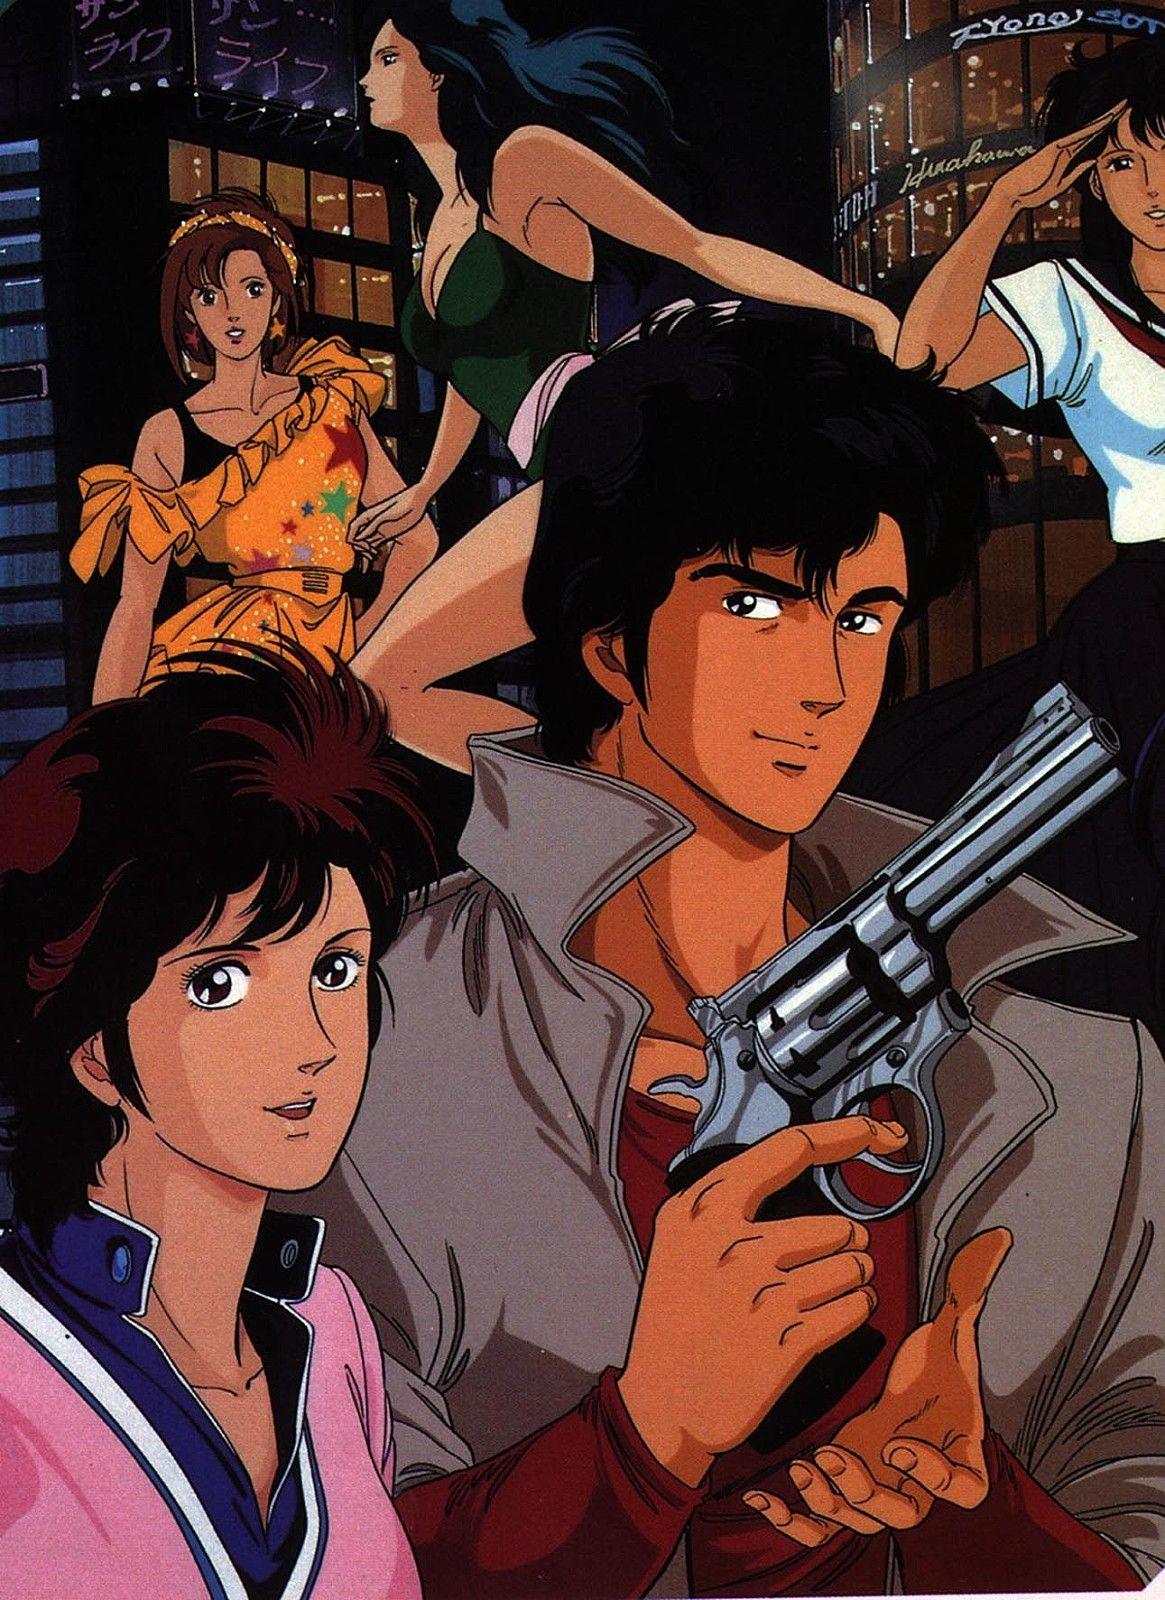 City Hunter |127/127| |Audio Castellano| |DVD Ligero| |Mega|